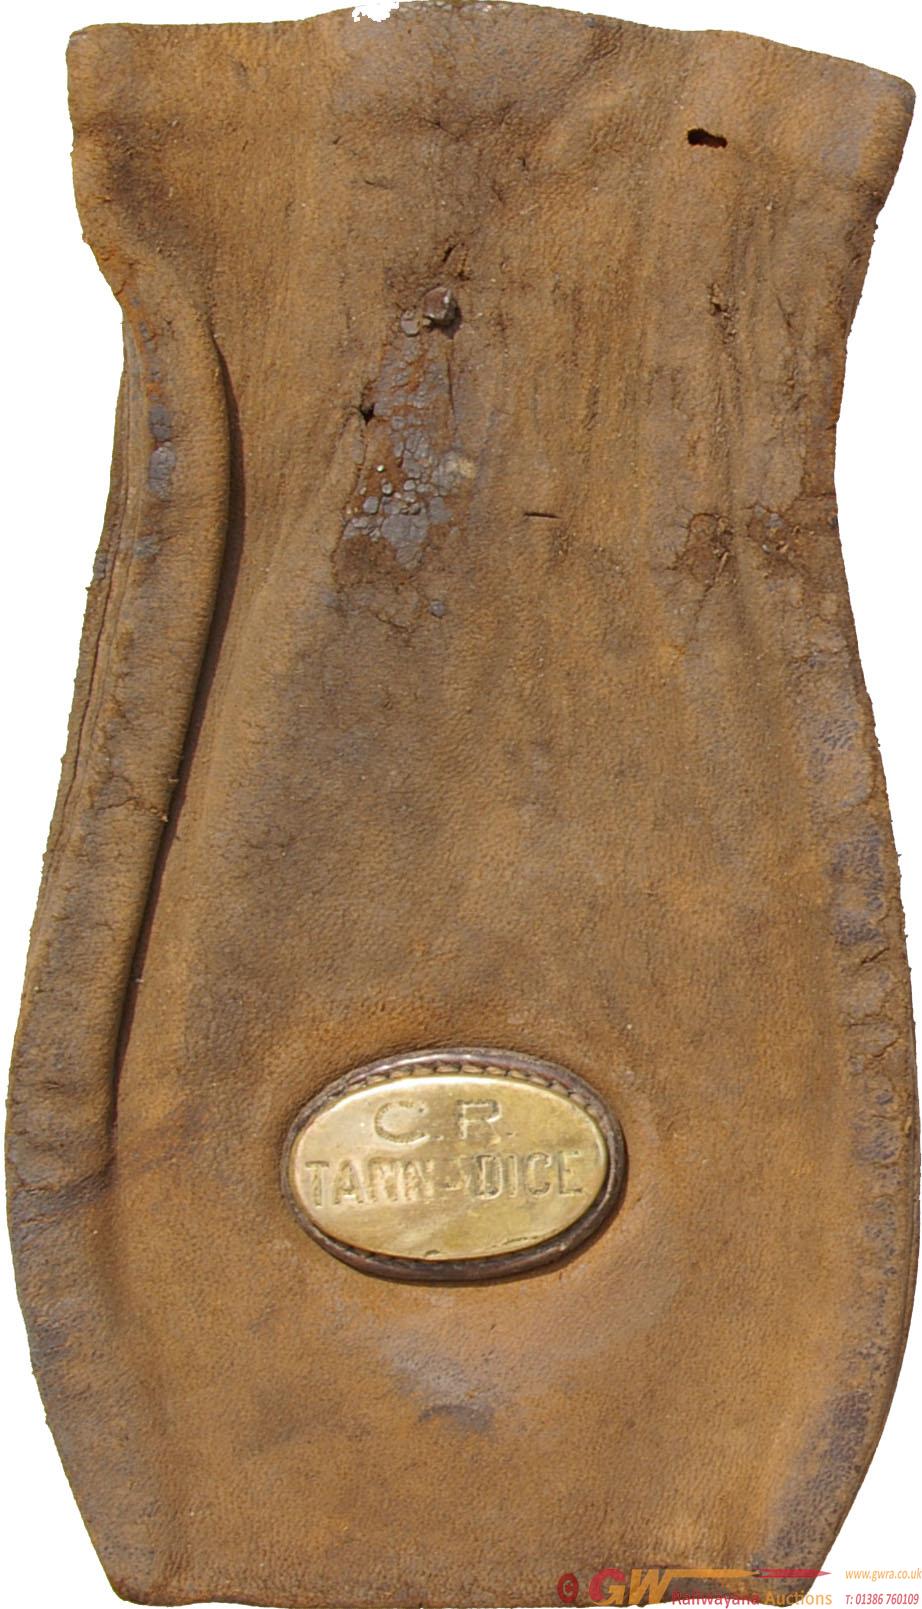 Caledonian Railway Leather Cash Bag Bearing A